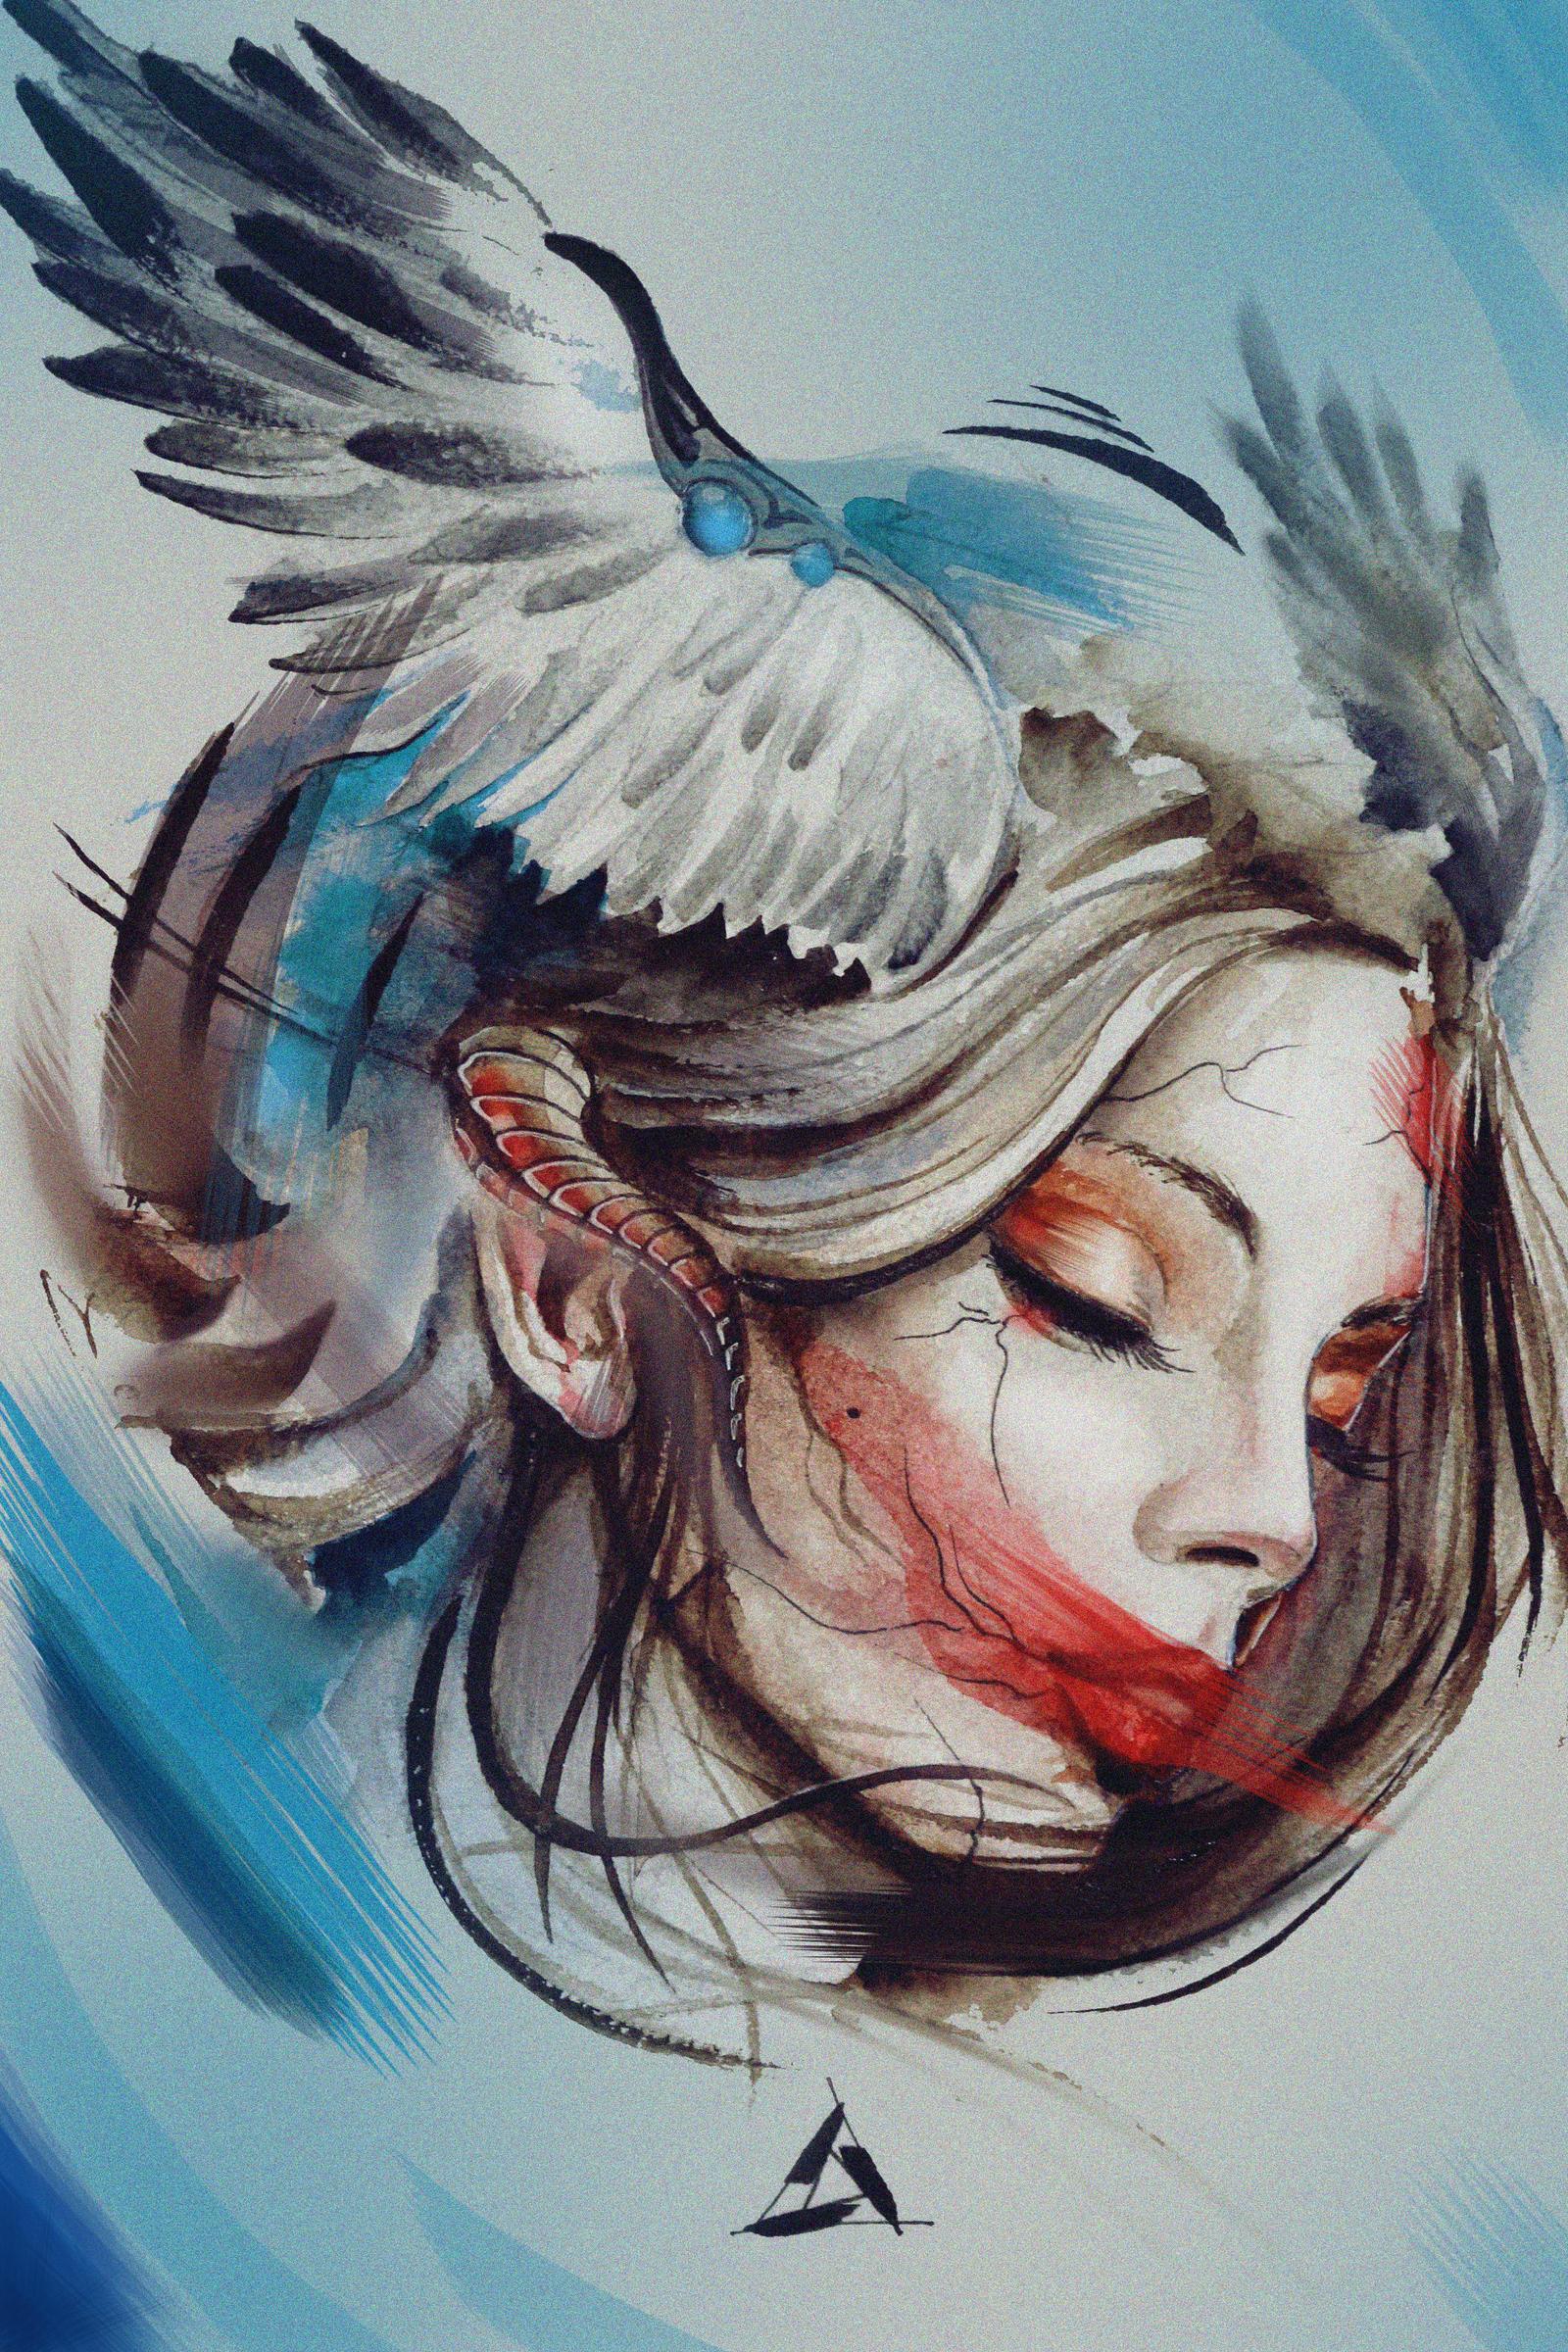 Wing cherries by LilinetKor